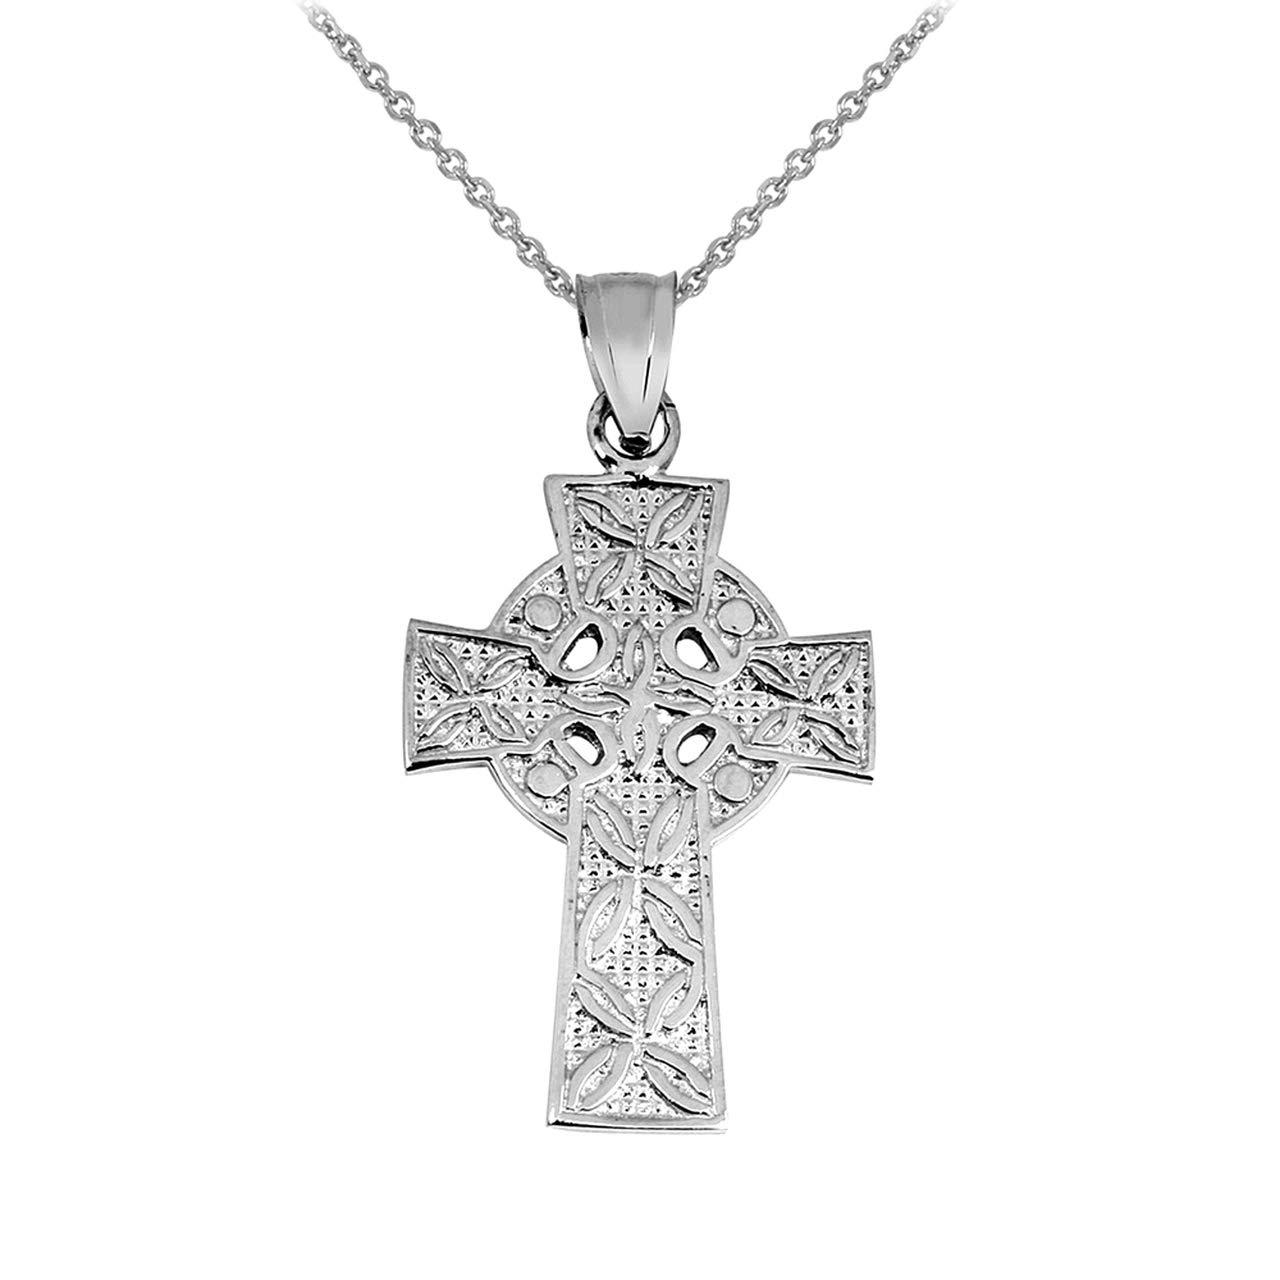 Solid 14k White Gold Irish Celtic Cross Trinity Pendant Necklace, 20''